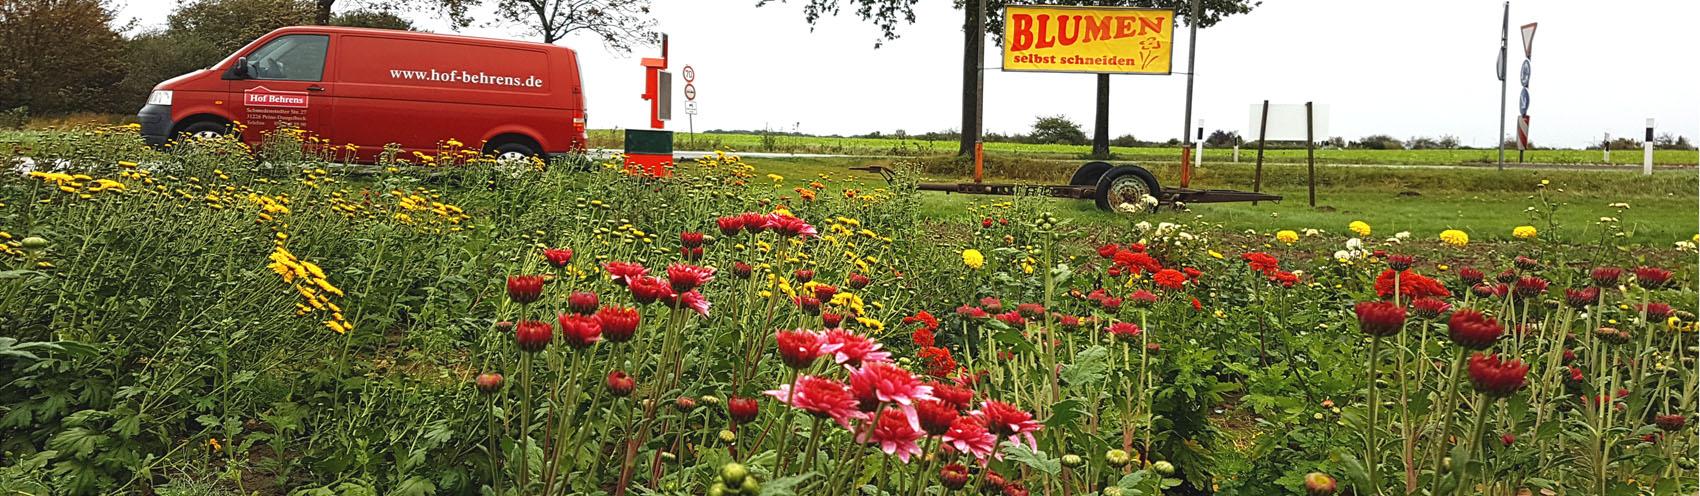 Blumenfelder Hof Behrens